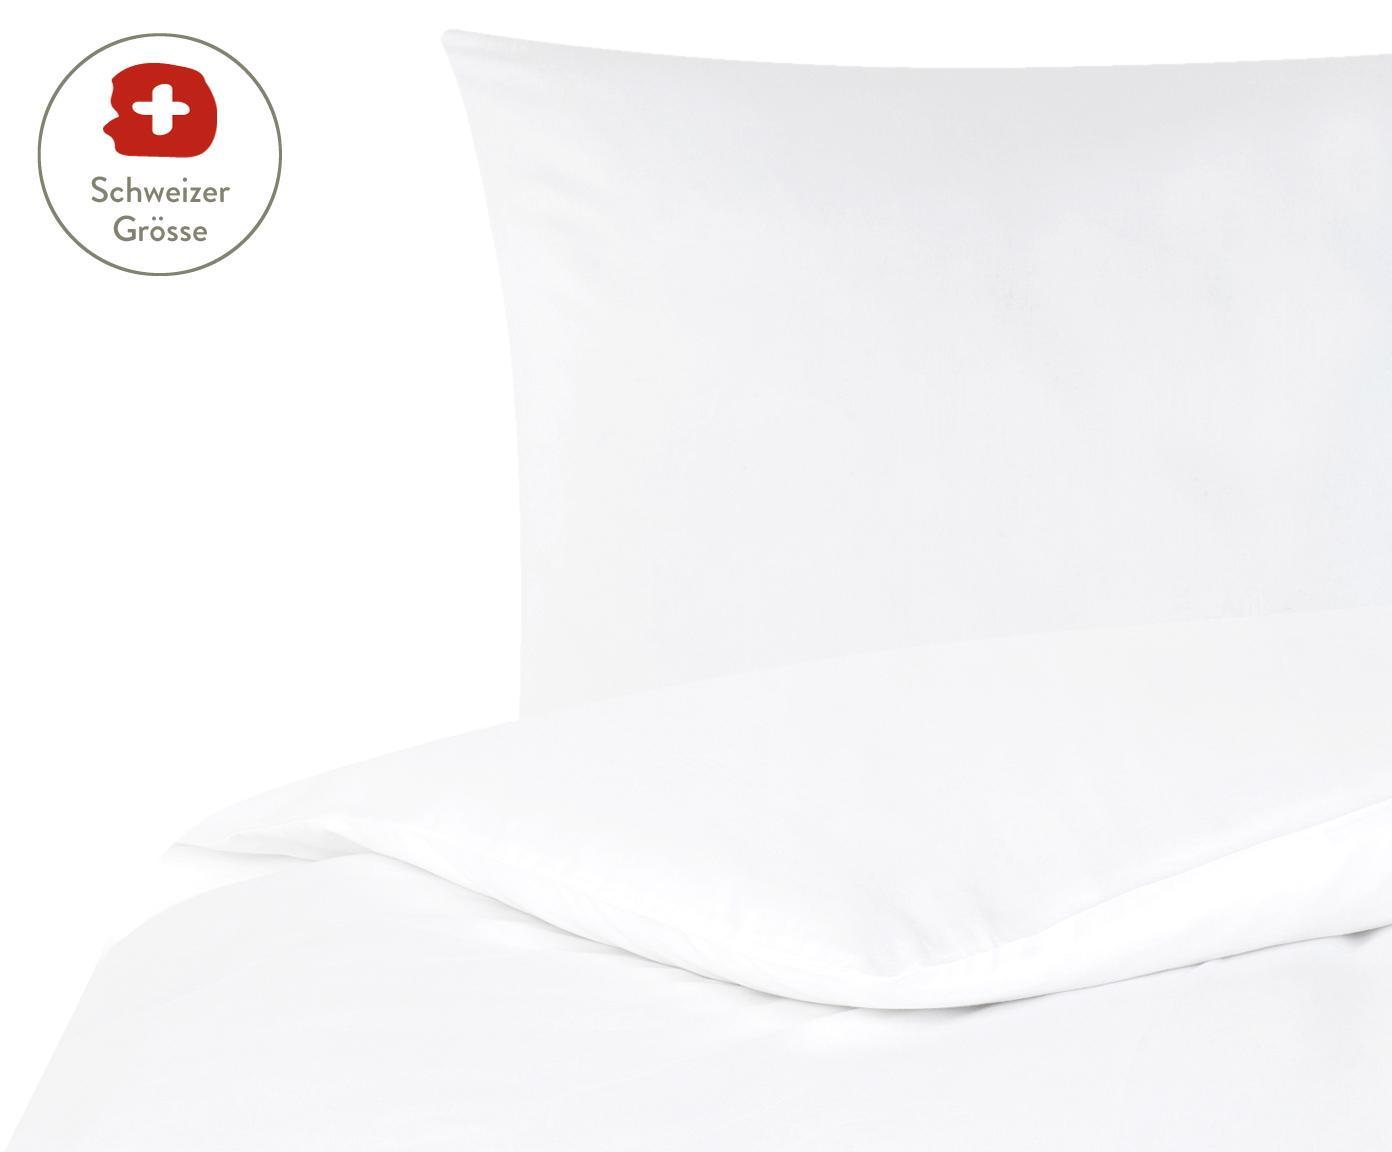 Baumwollsatin-Bettdeckenbezug Comfort in Weiss, Webart: Satin, leicht glänzend, Weiss, 160 x 210 cm